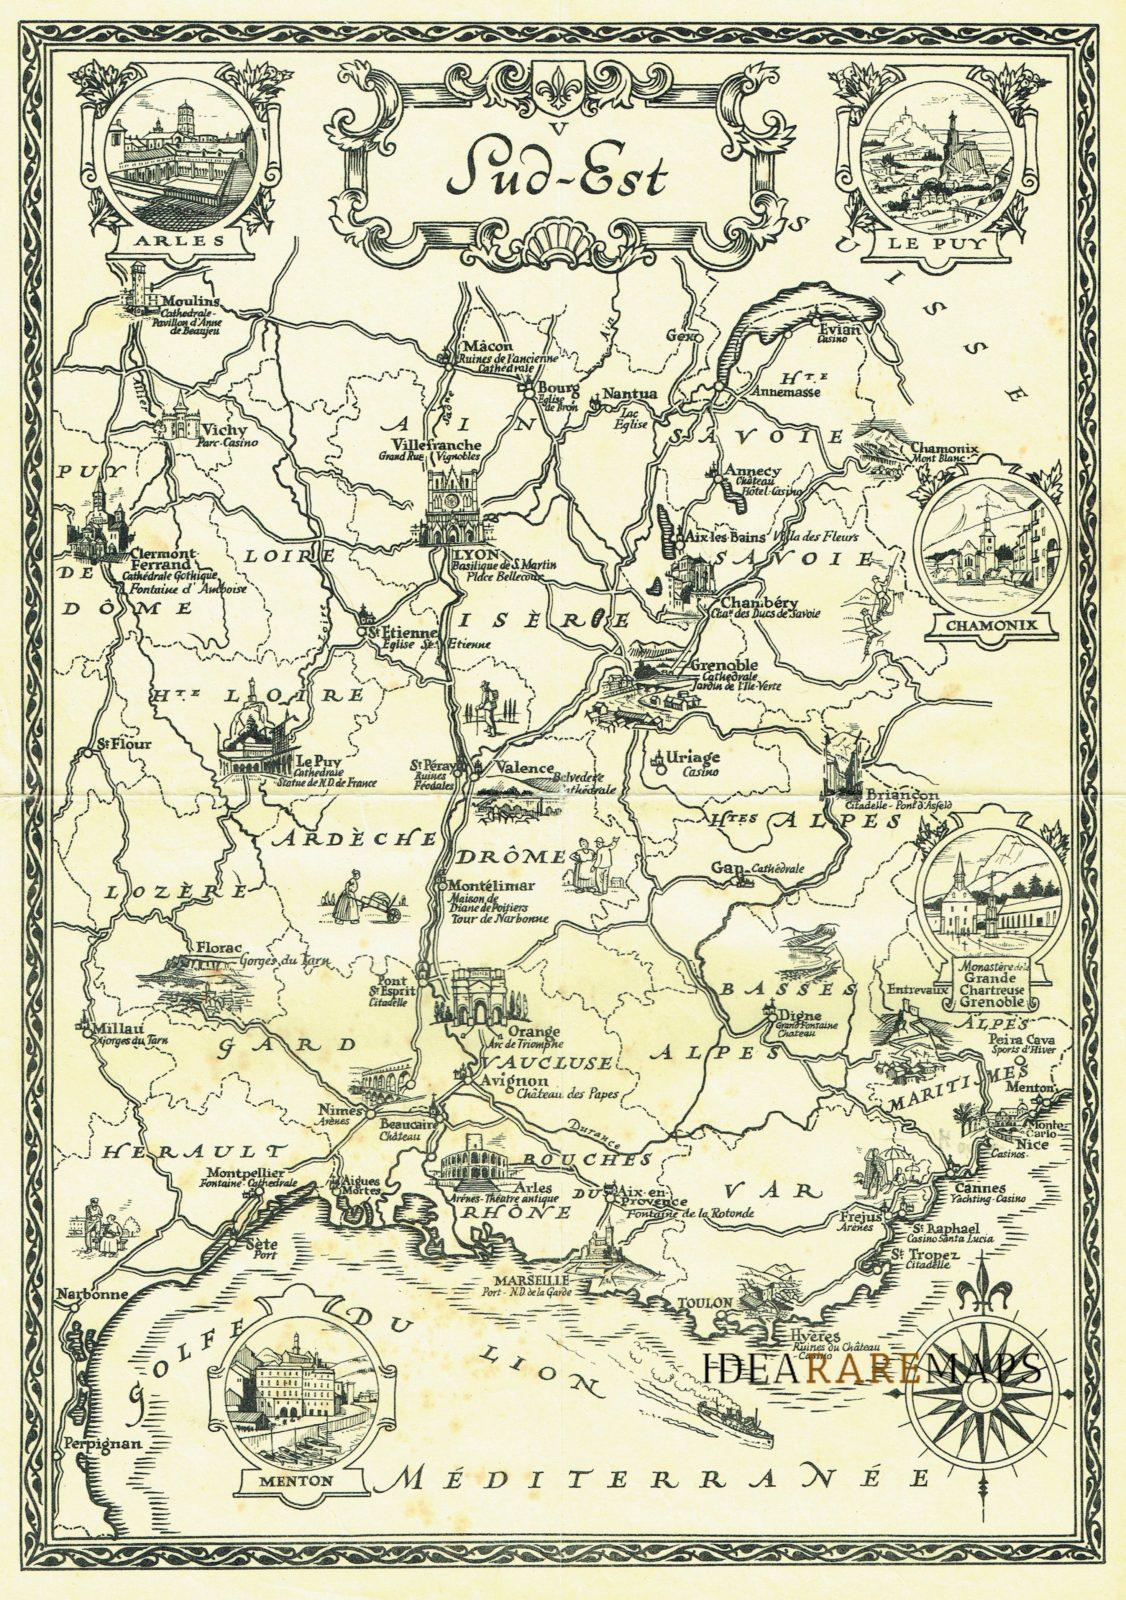 Francia Costa Azzurra Cartina Geografica.Sud Est Francia Costa Azzurra Idea Rare Maps